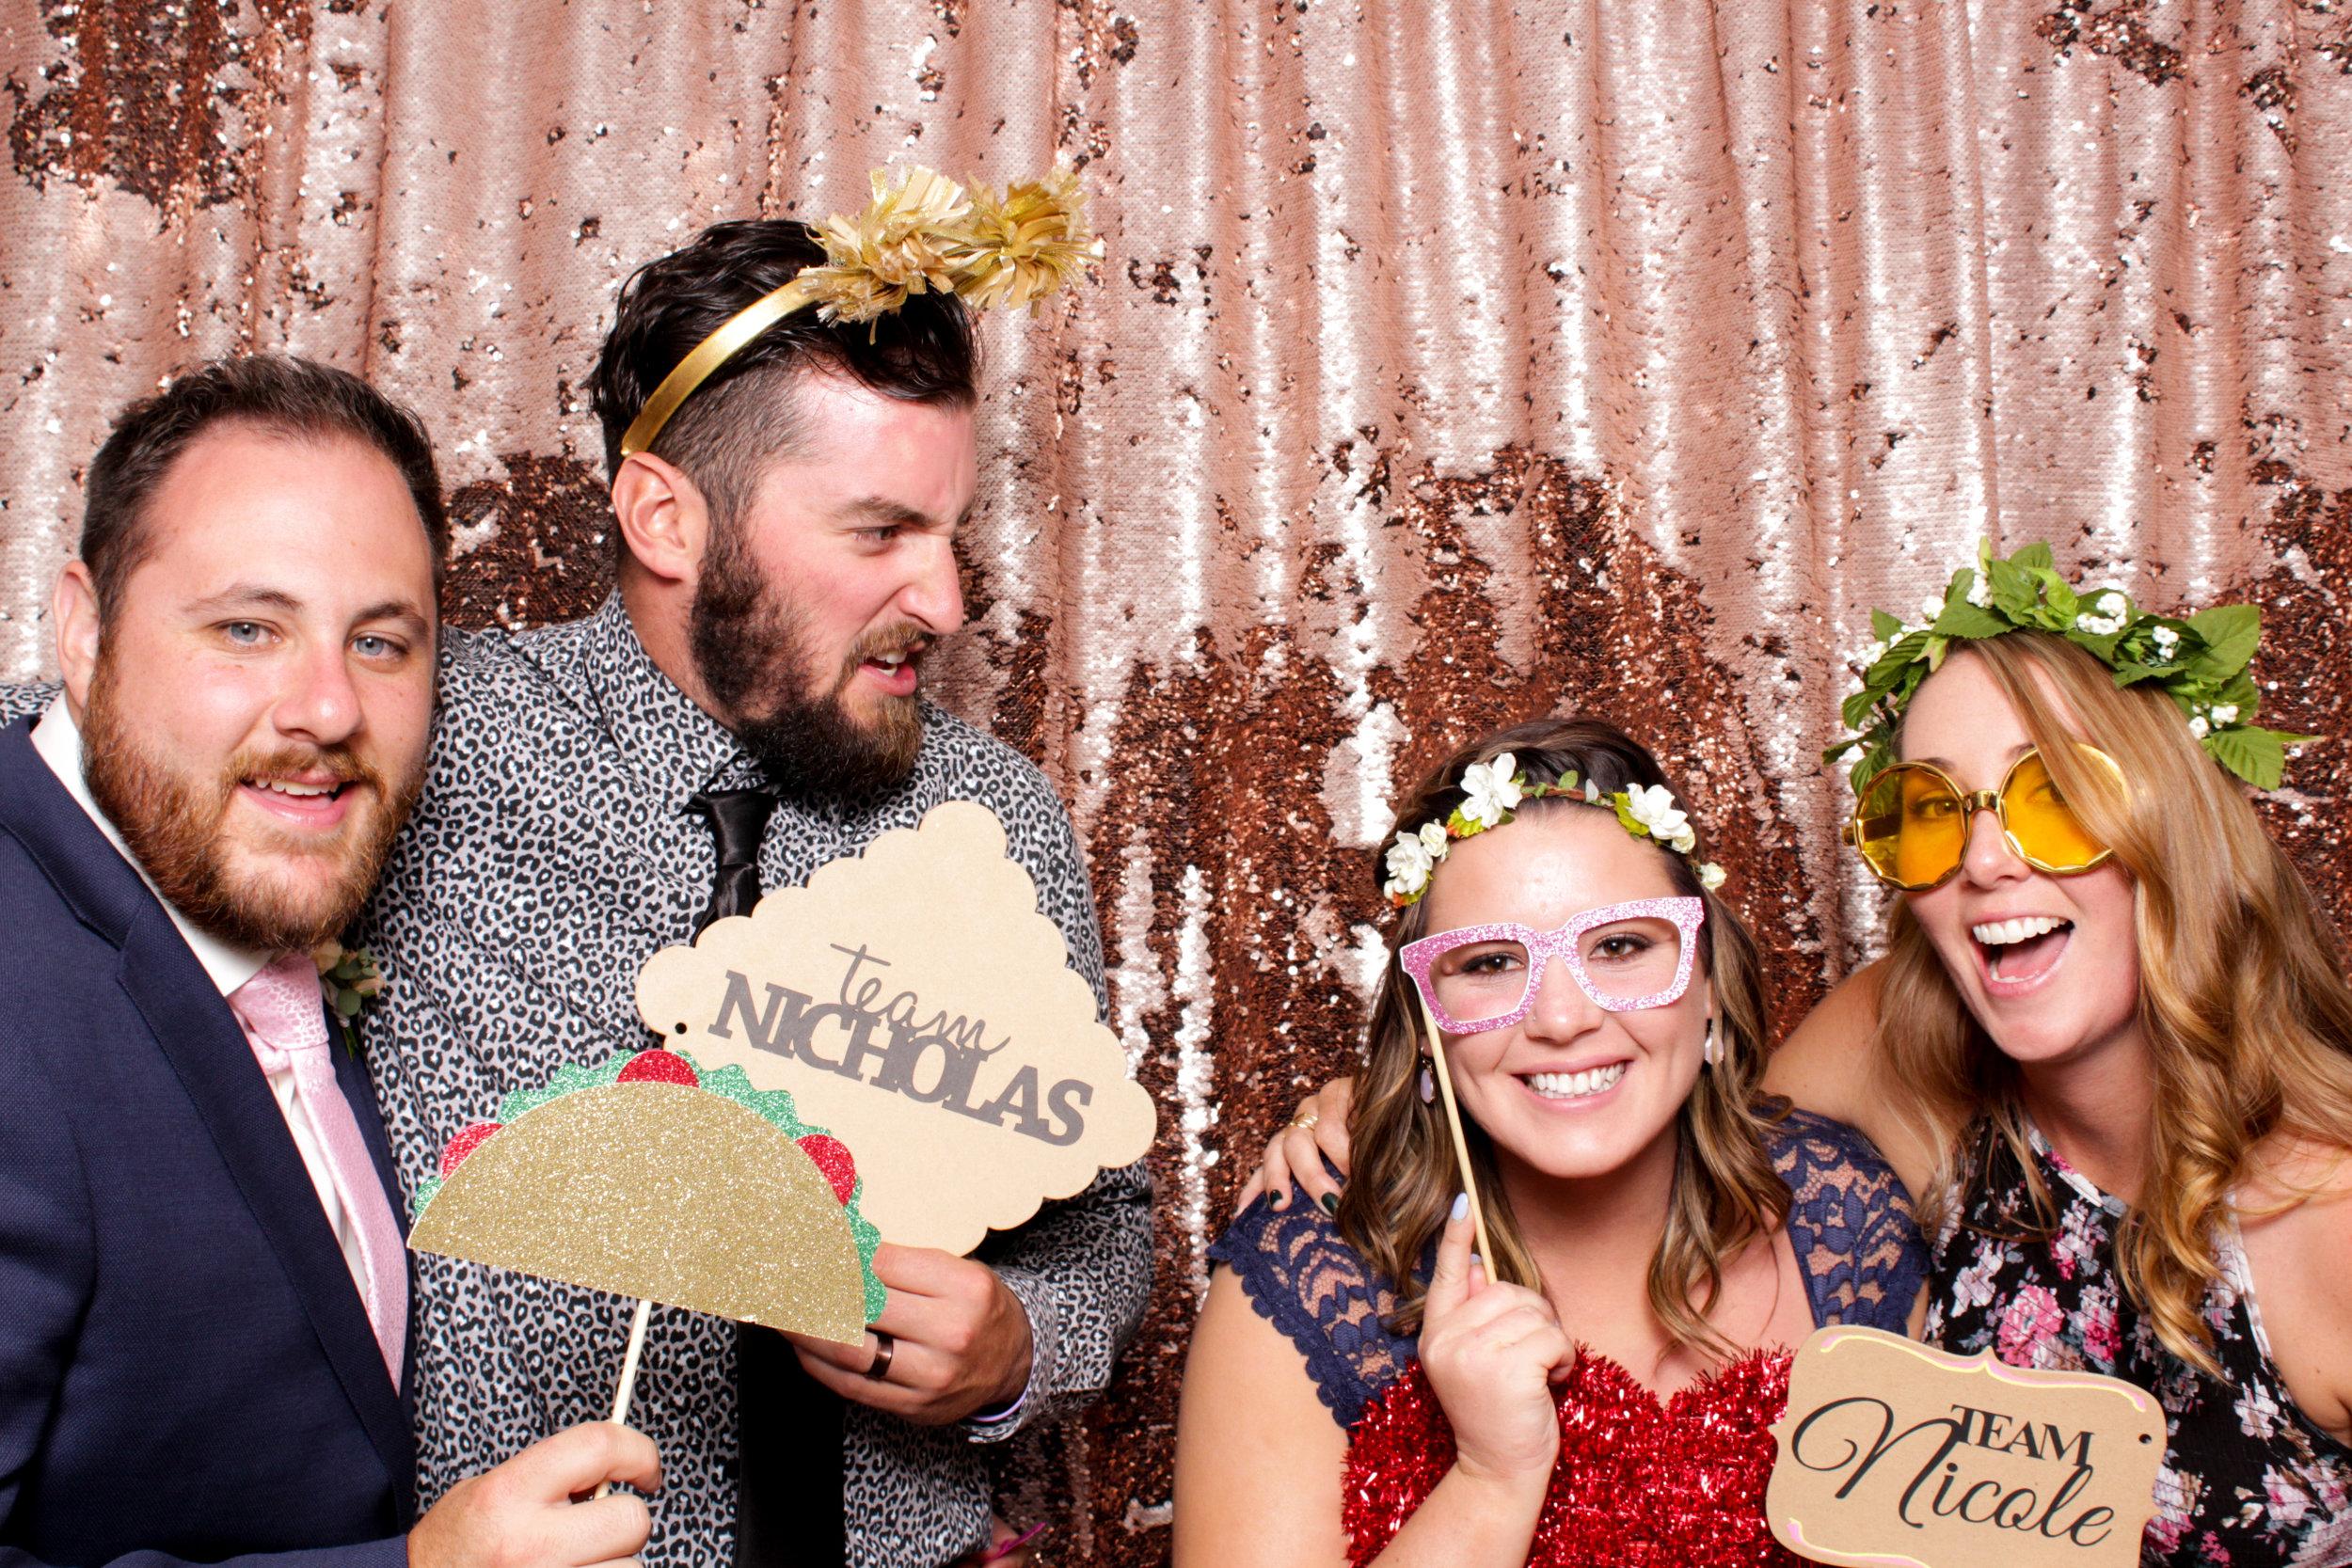 FOTOMOJI_Calgary_Wedding_Photo_Booth_Rental-88.jpg